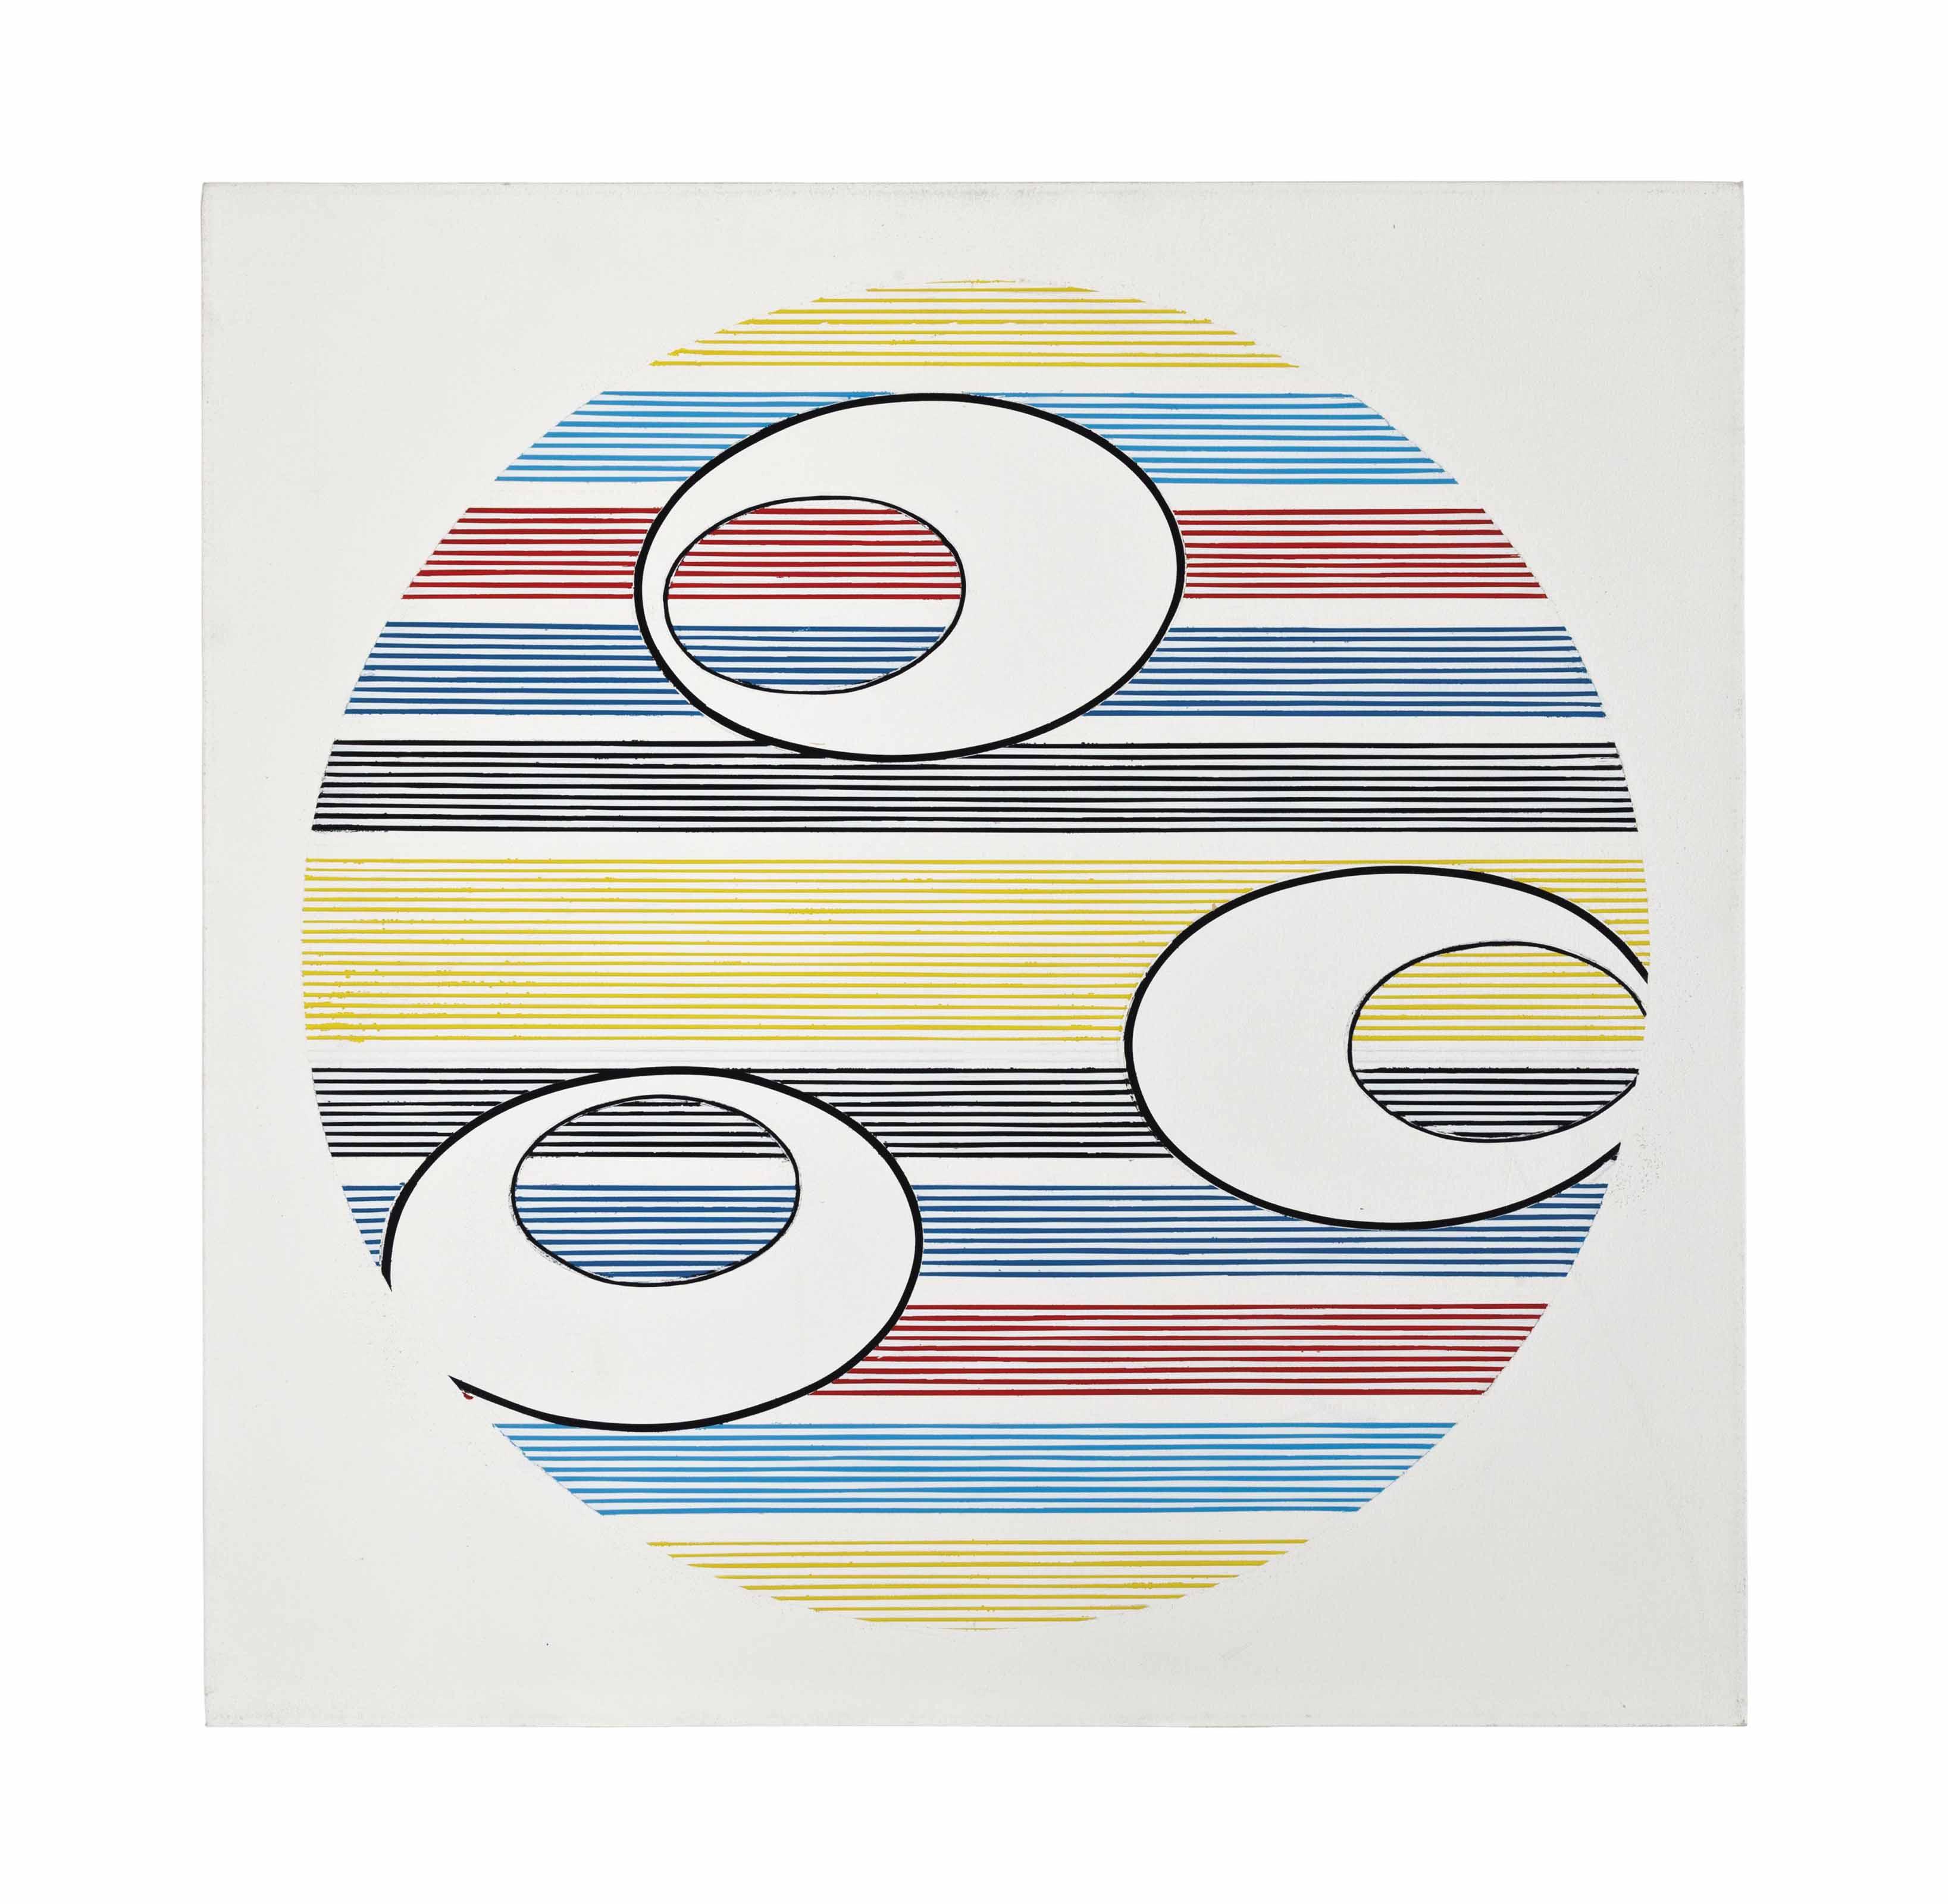 Nassos Daphnis (American, b. 1